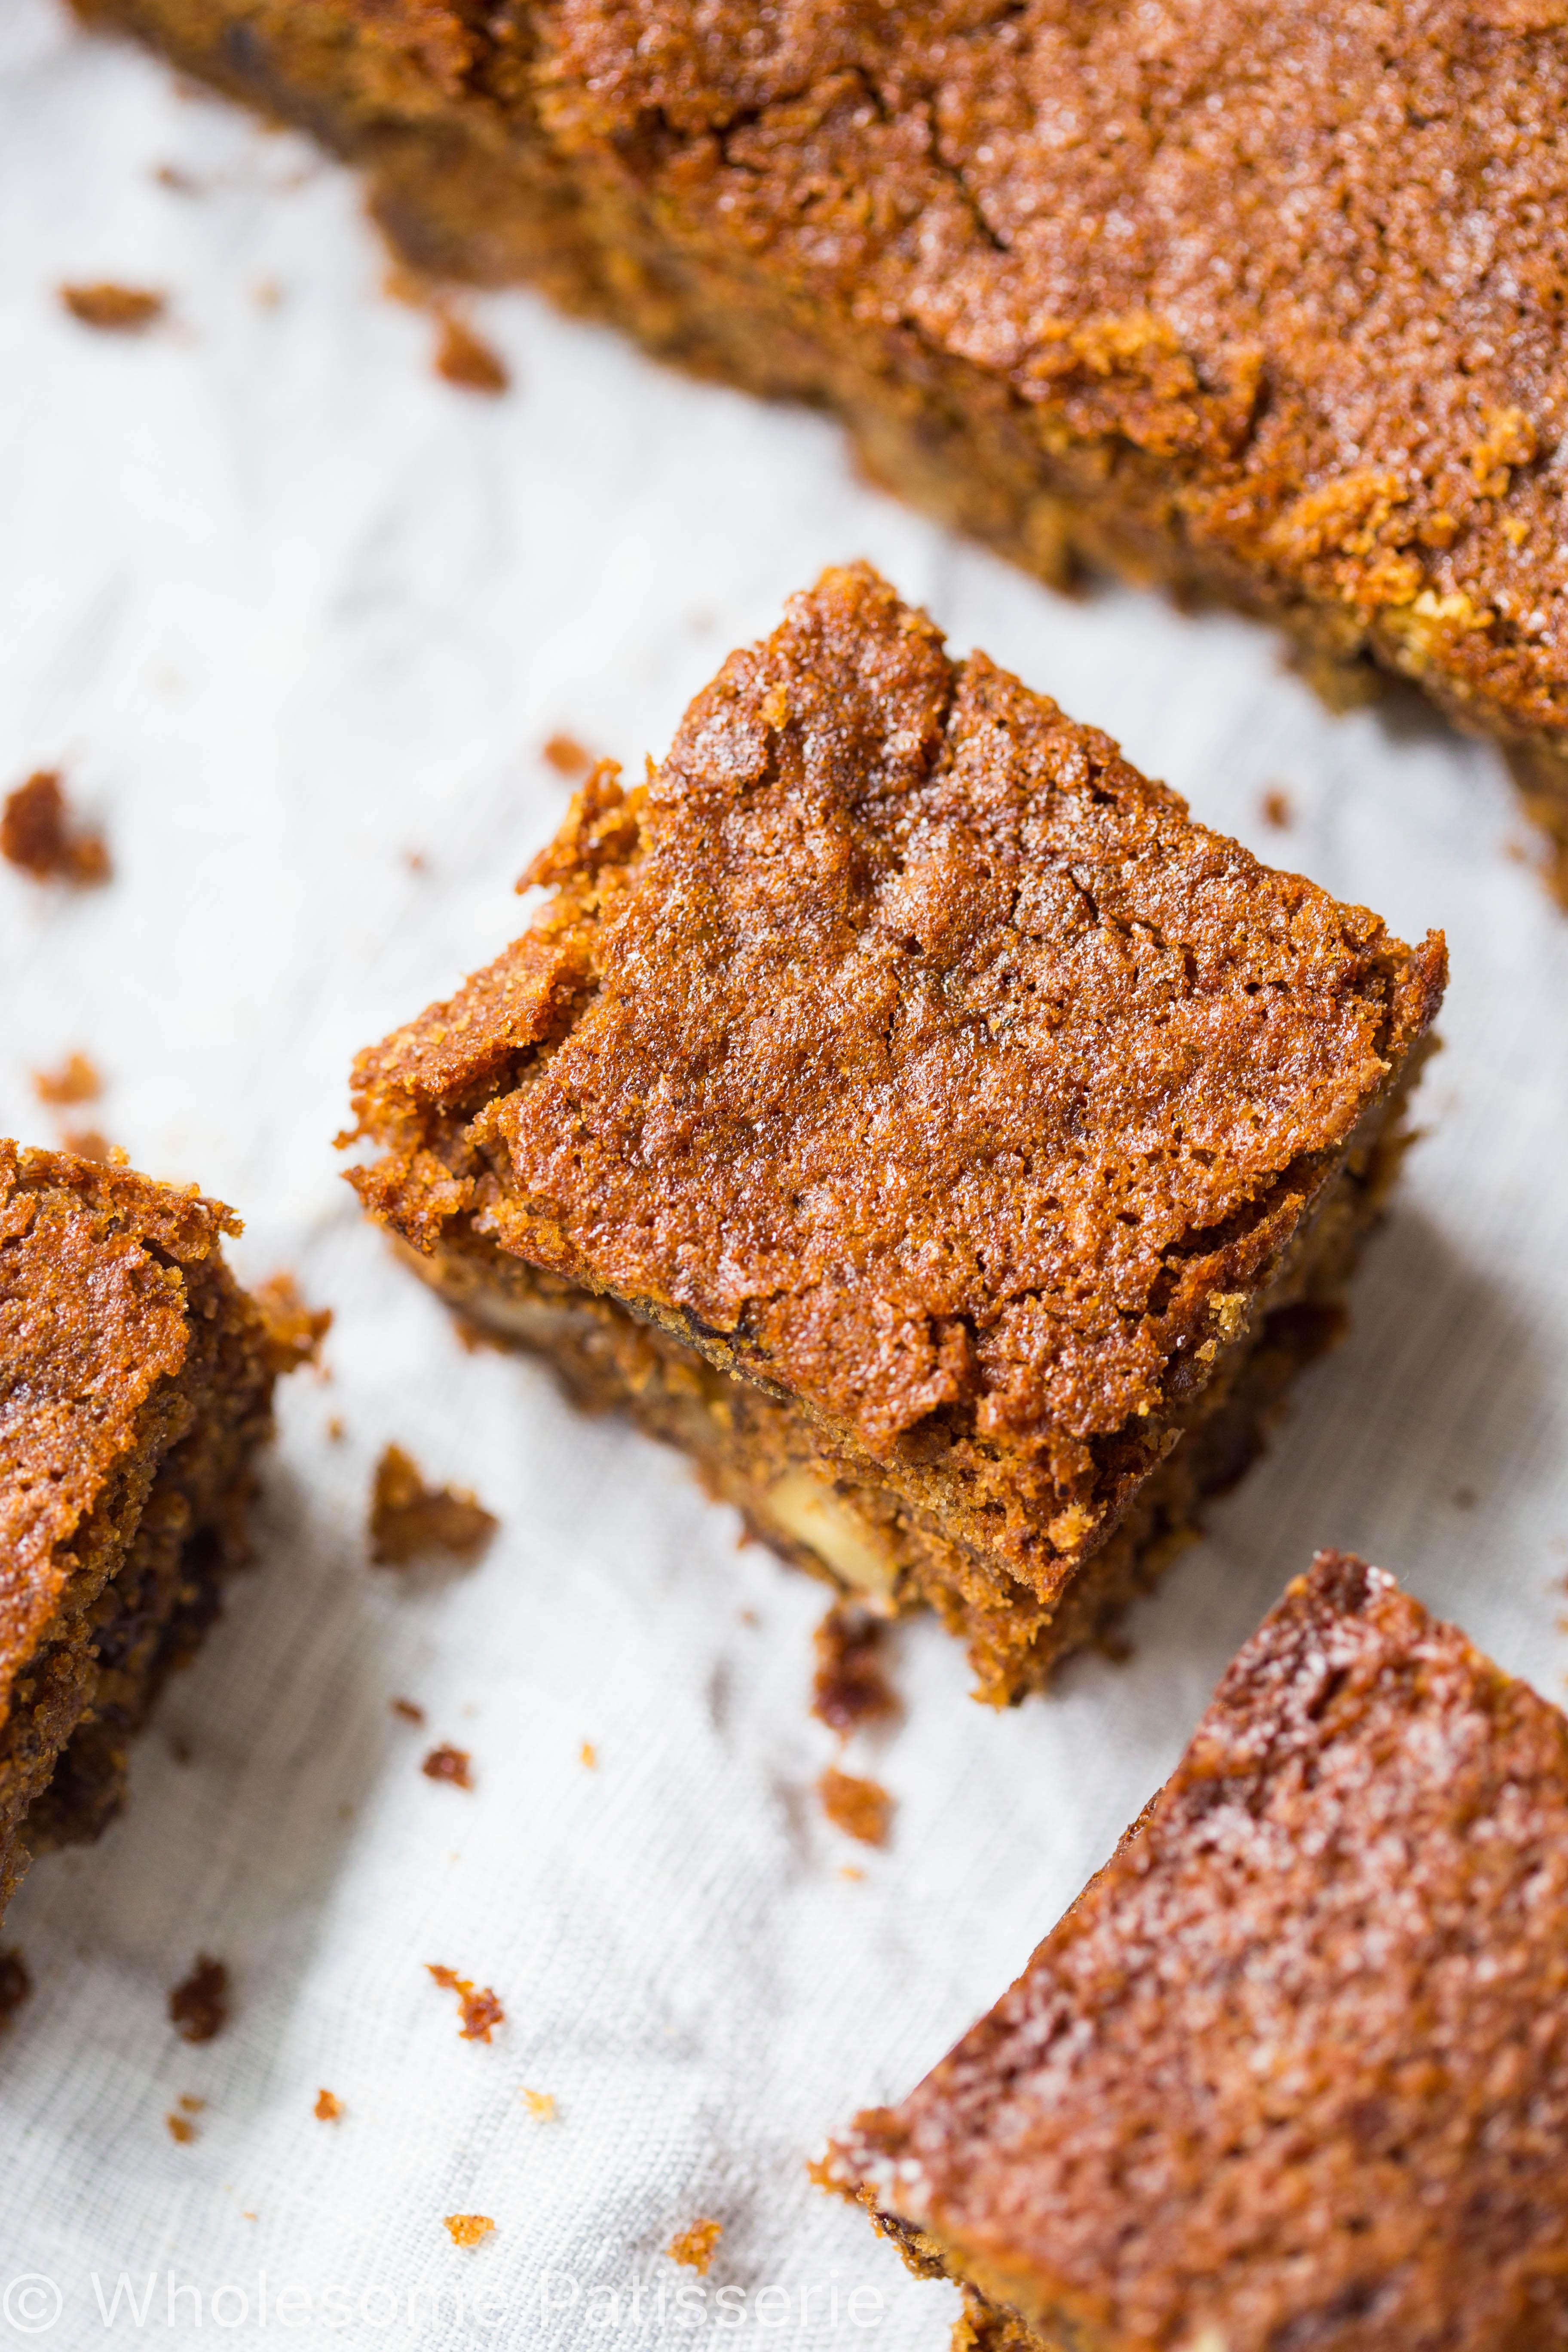 gluten-free-raisin-walnut-cake-loaf-delicious-fruit-cake-christmas-festive-the-holidays